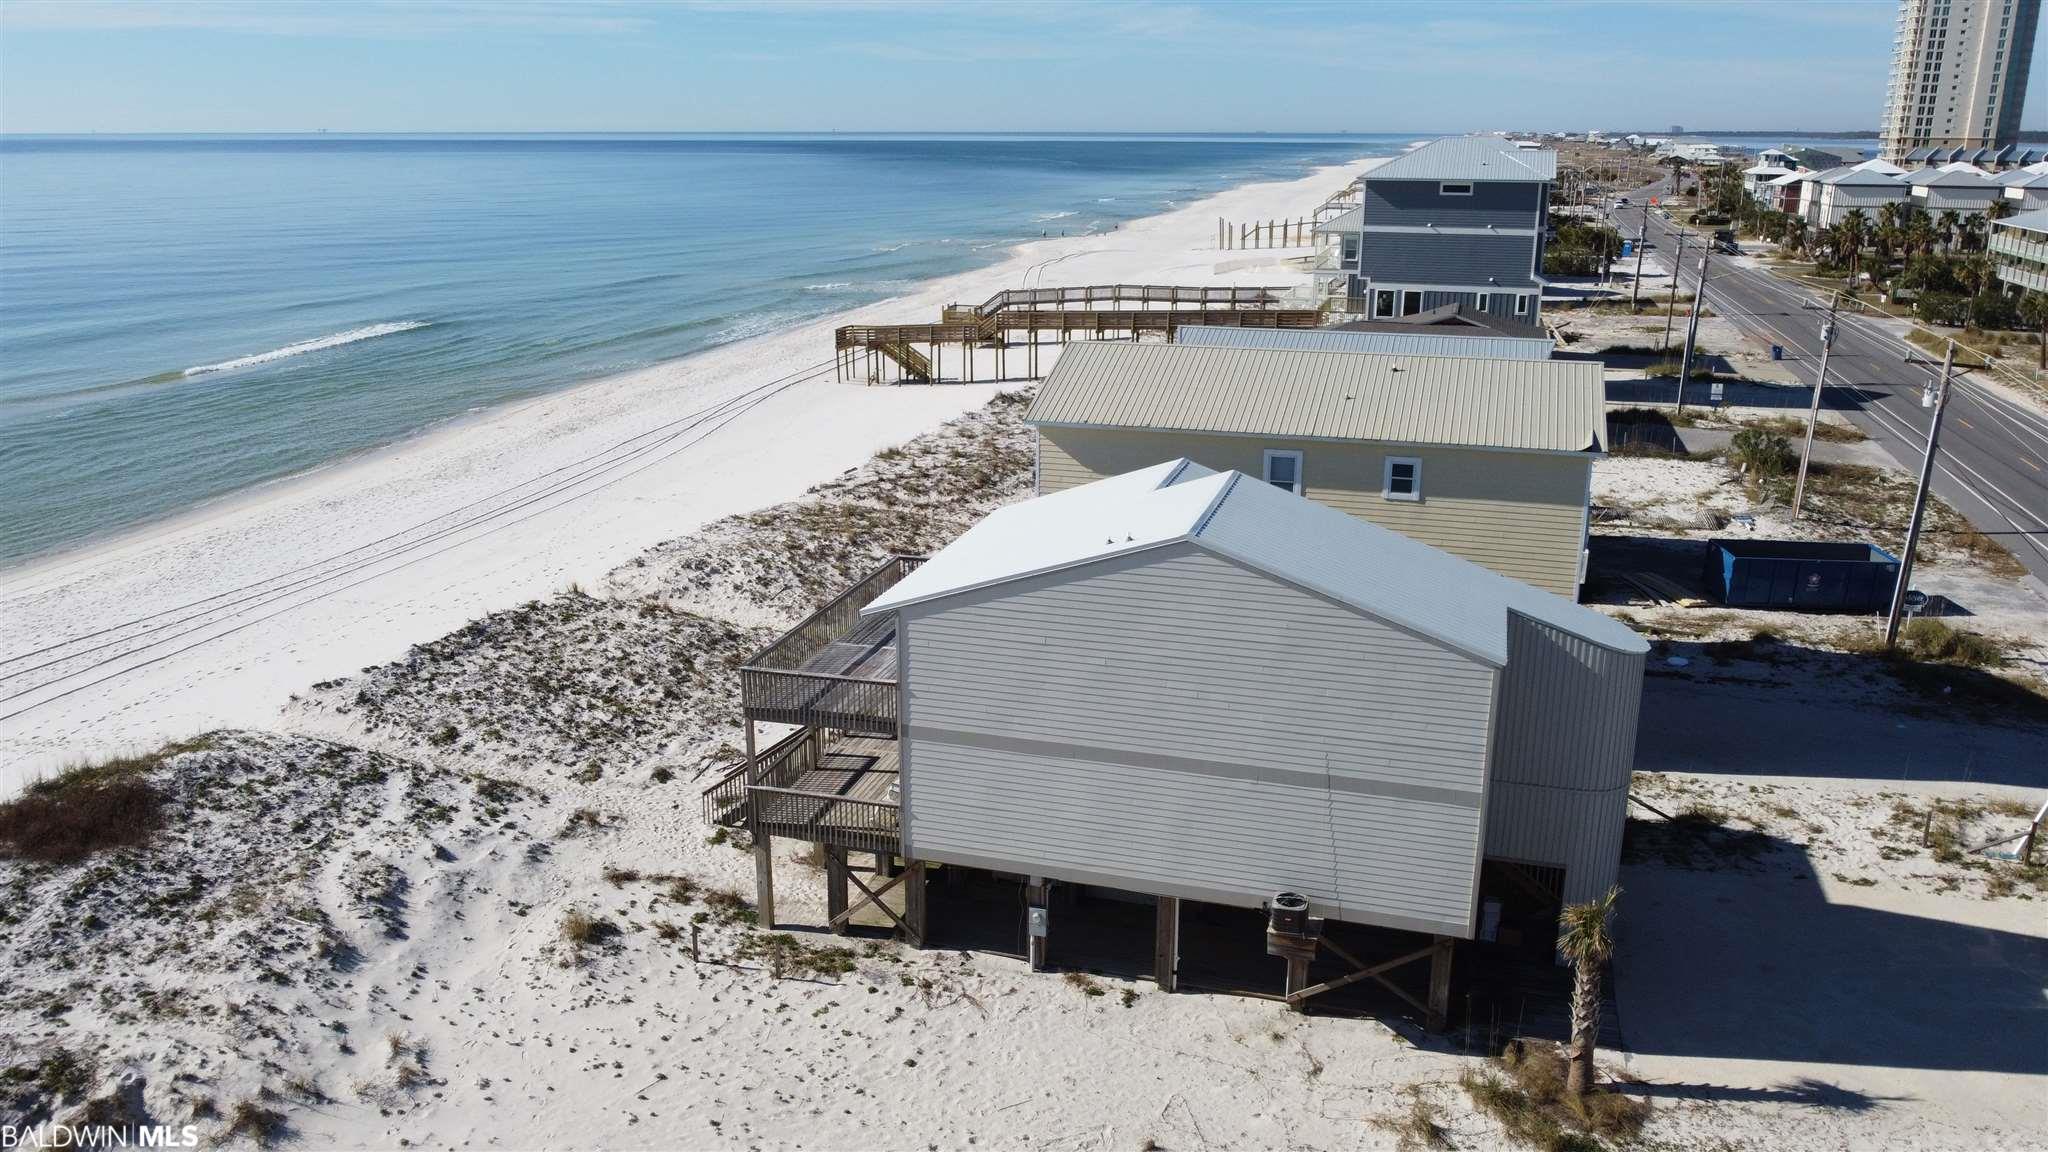 1869 W Beach Blvd, Gulf Shores, AL 36542